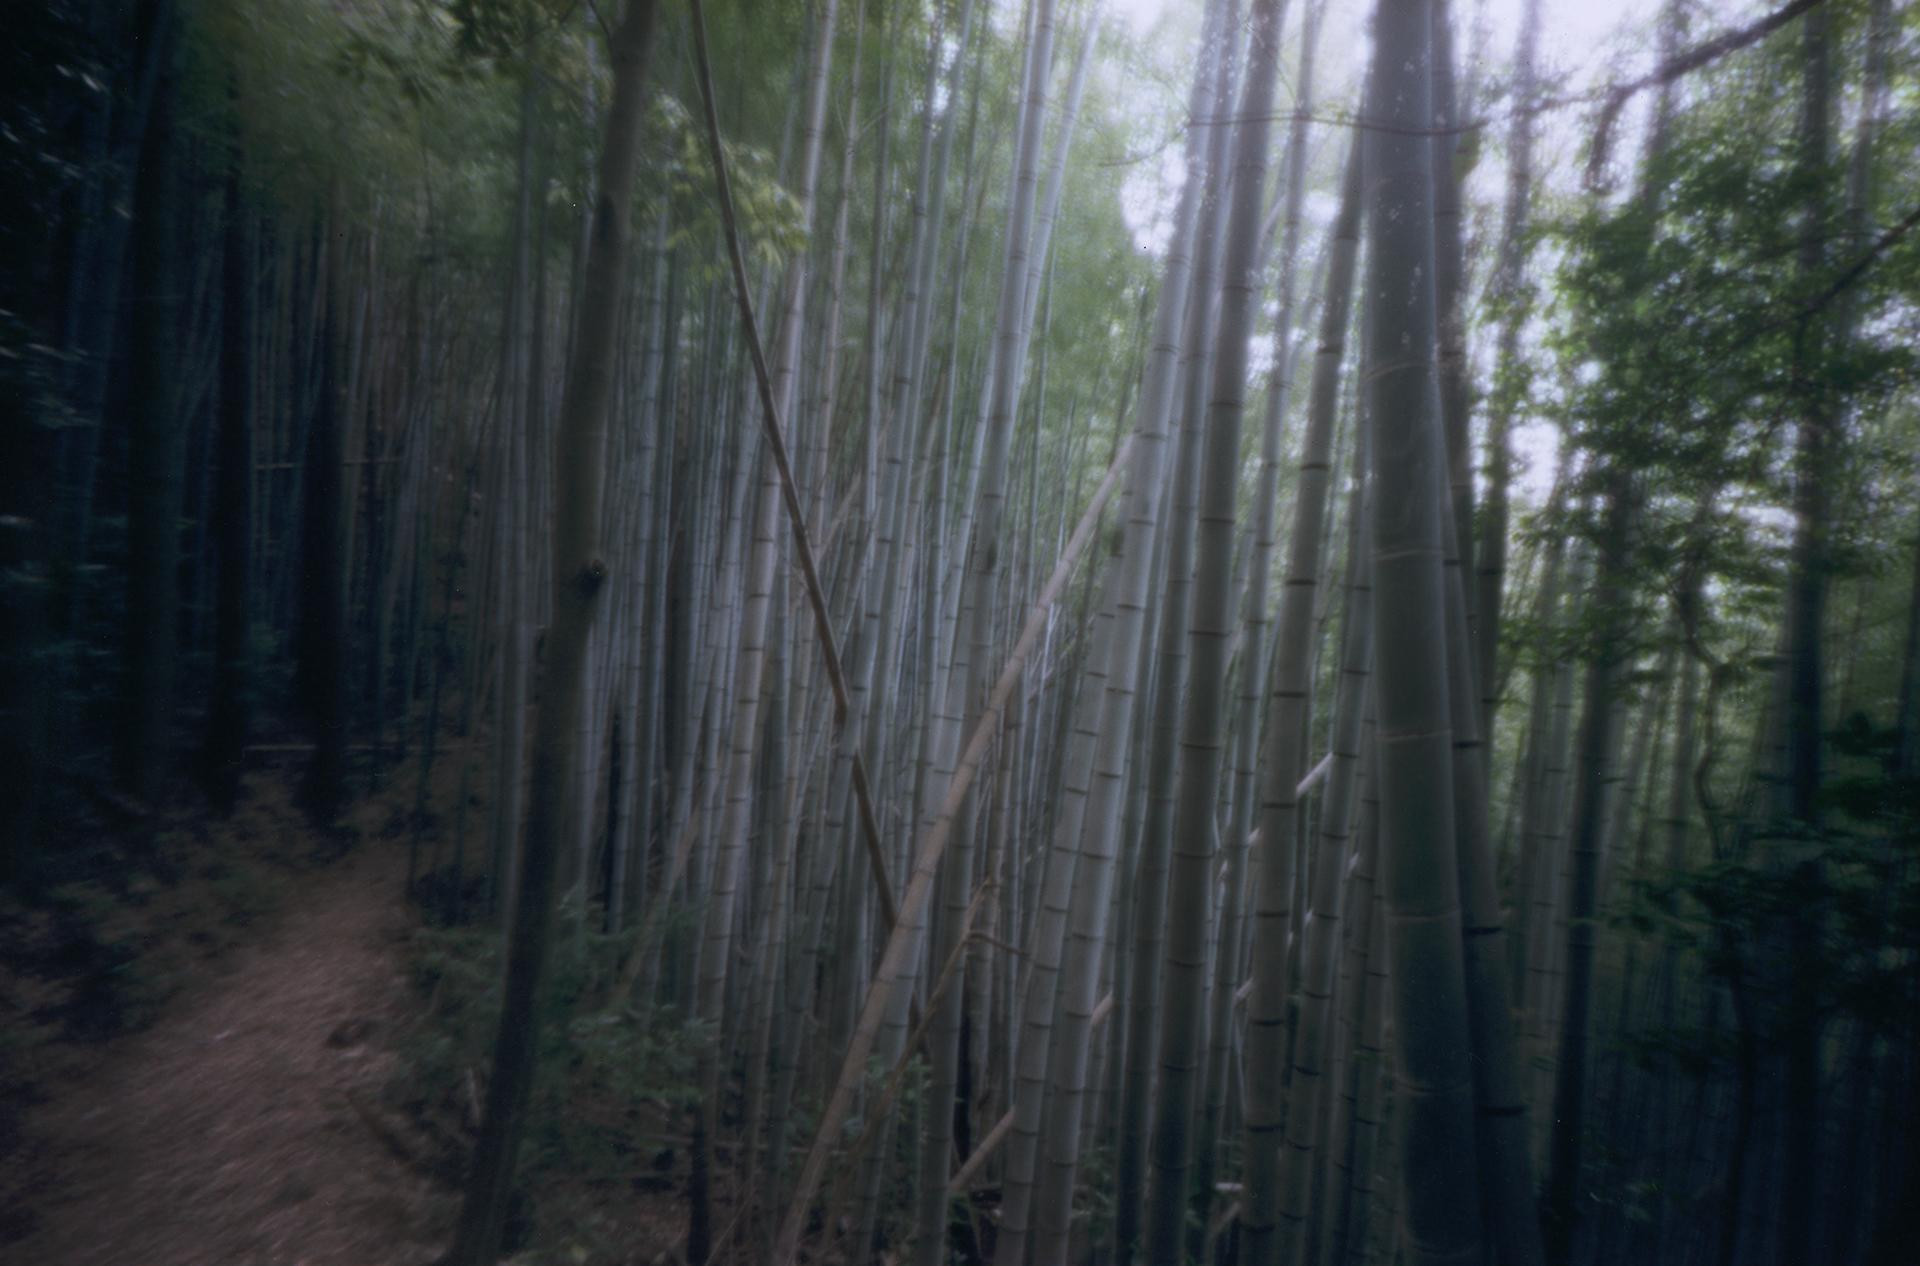 Blue forest. Shikoku, Japan, 2013